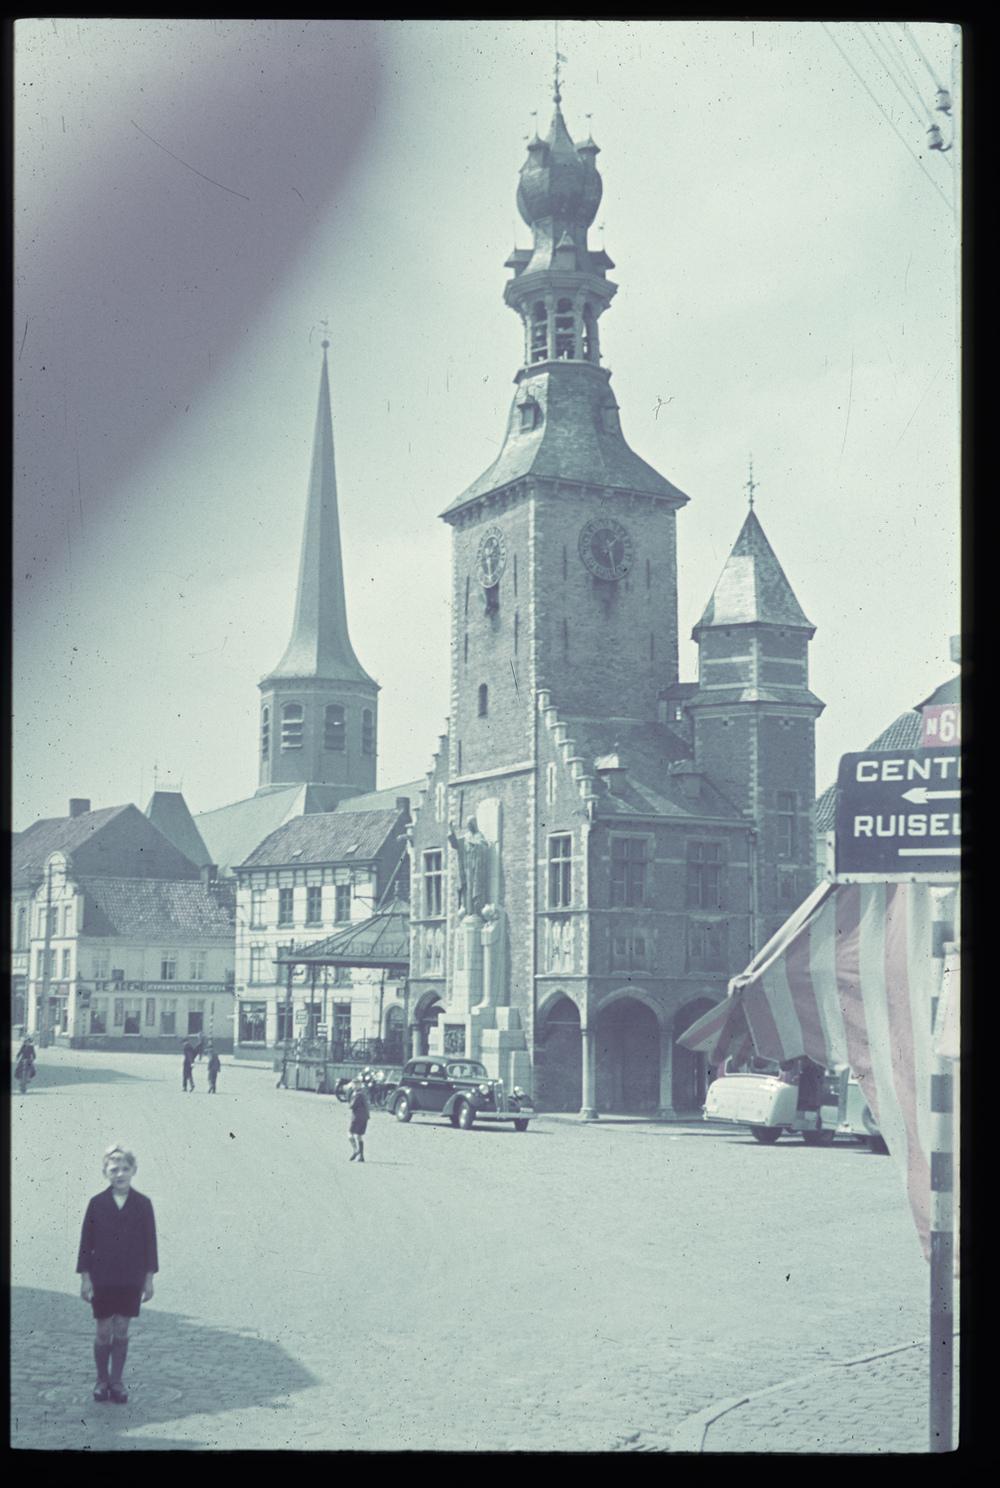 estibalitzphotography - Recovering photos from M. d'Haene (Tielt, 1938 - 1950)